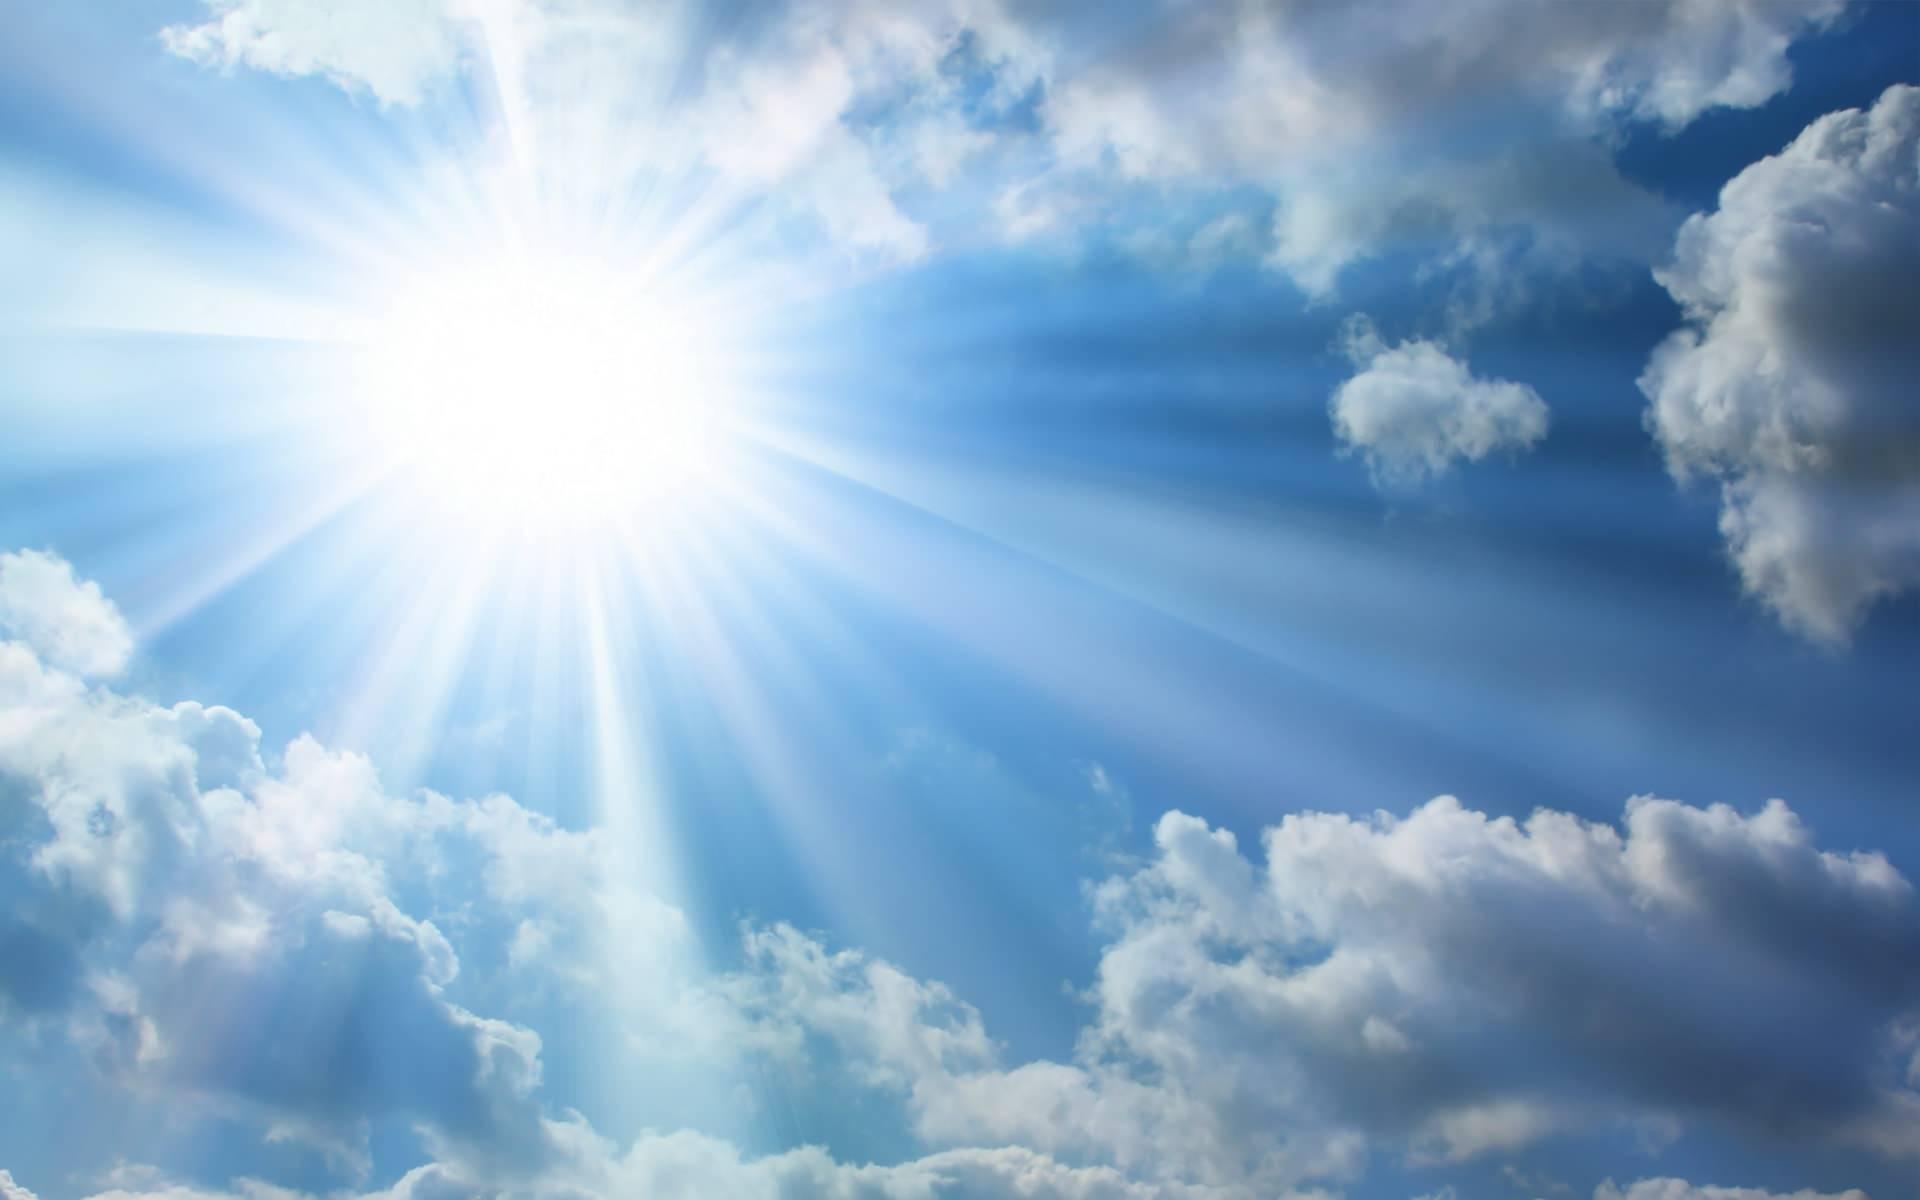 bright sun and sky background   WpFASTER